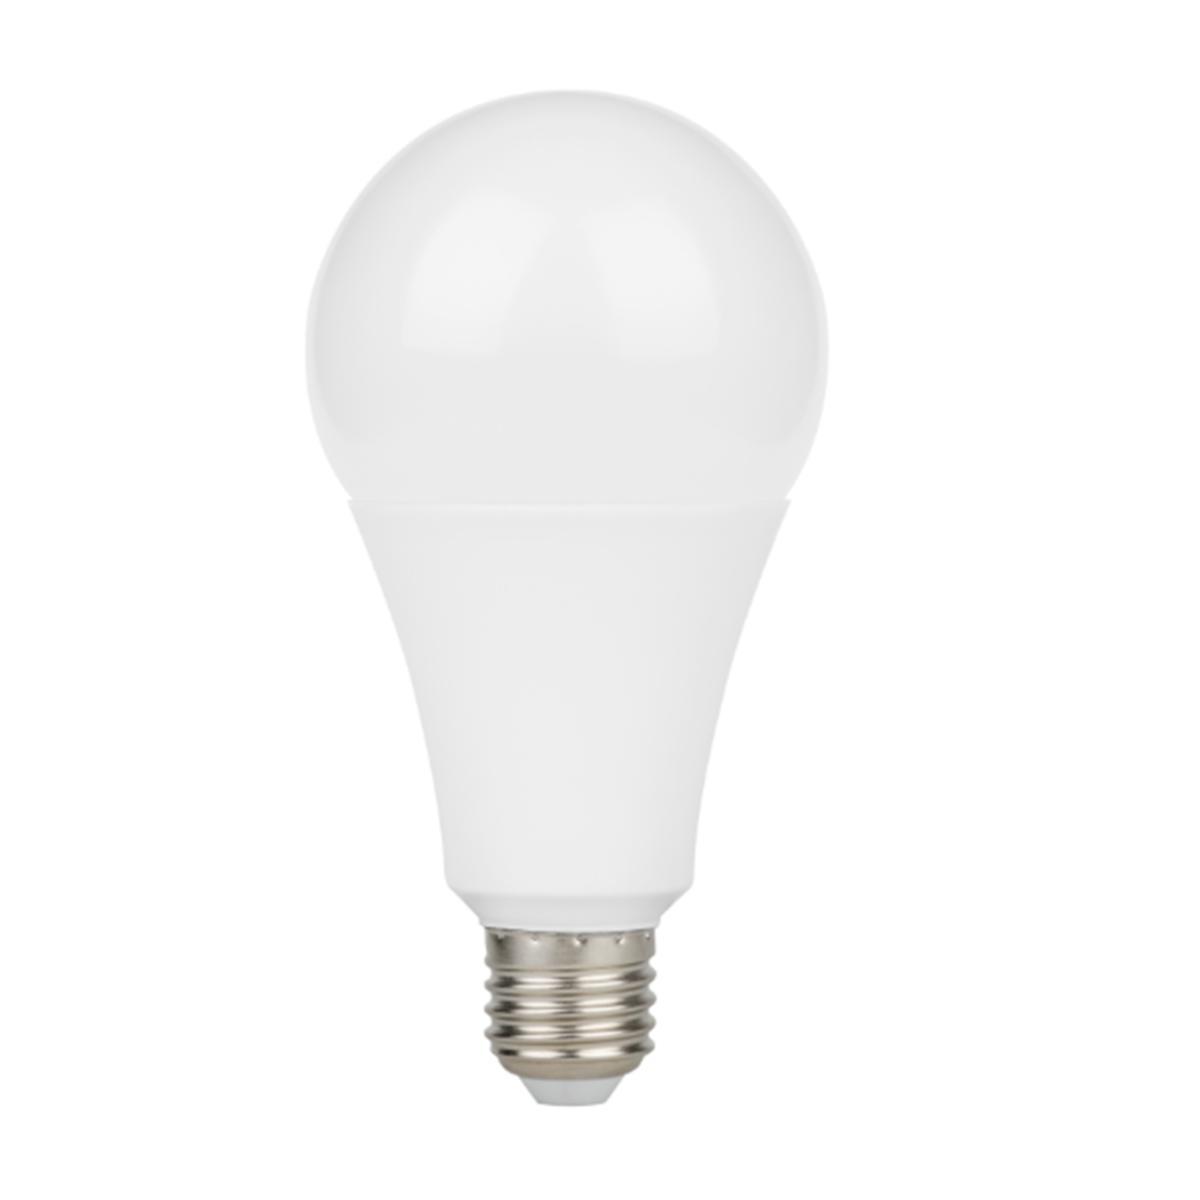 SILAMP Ampoule LED E27 18W A80 220V 230° - Blanc Neutre 4000K - 5500K